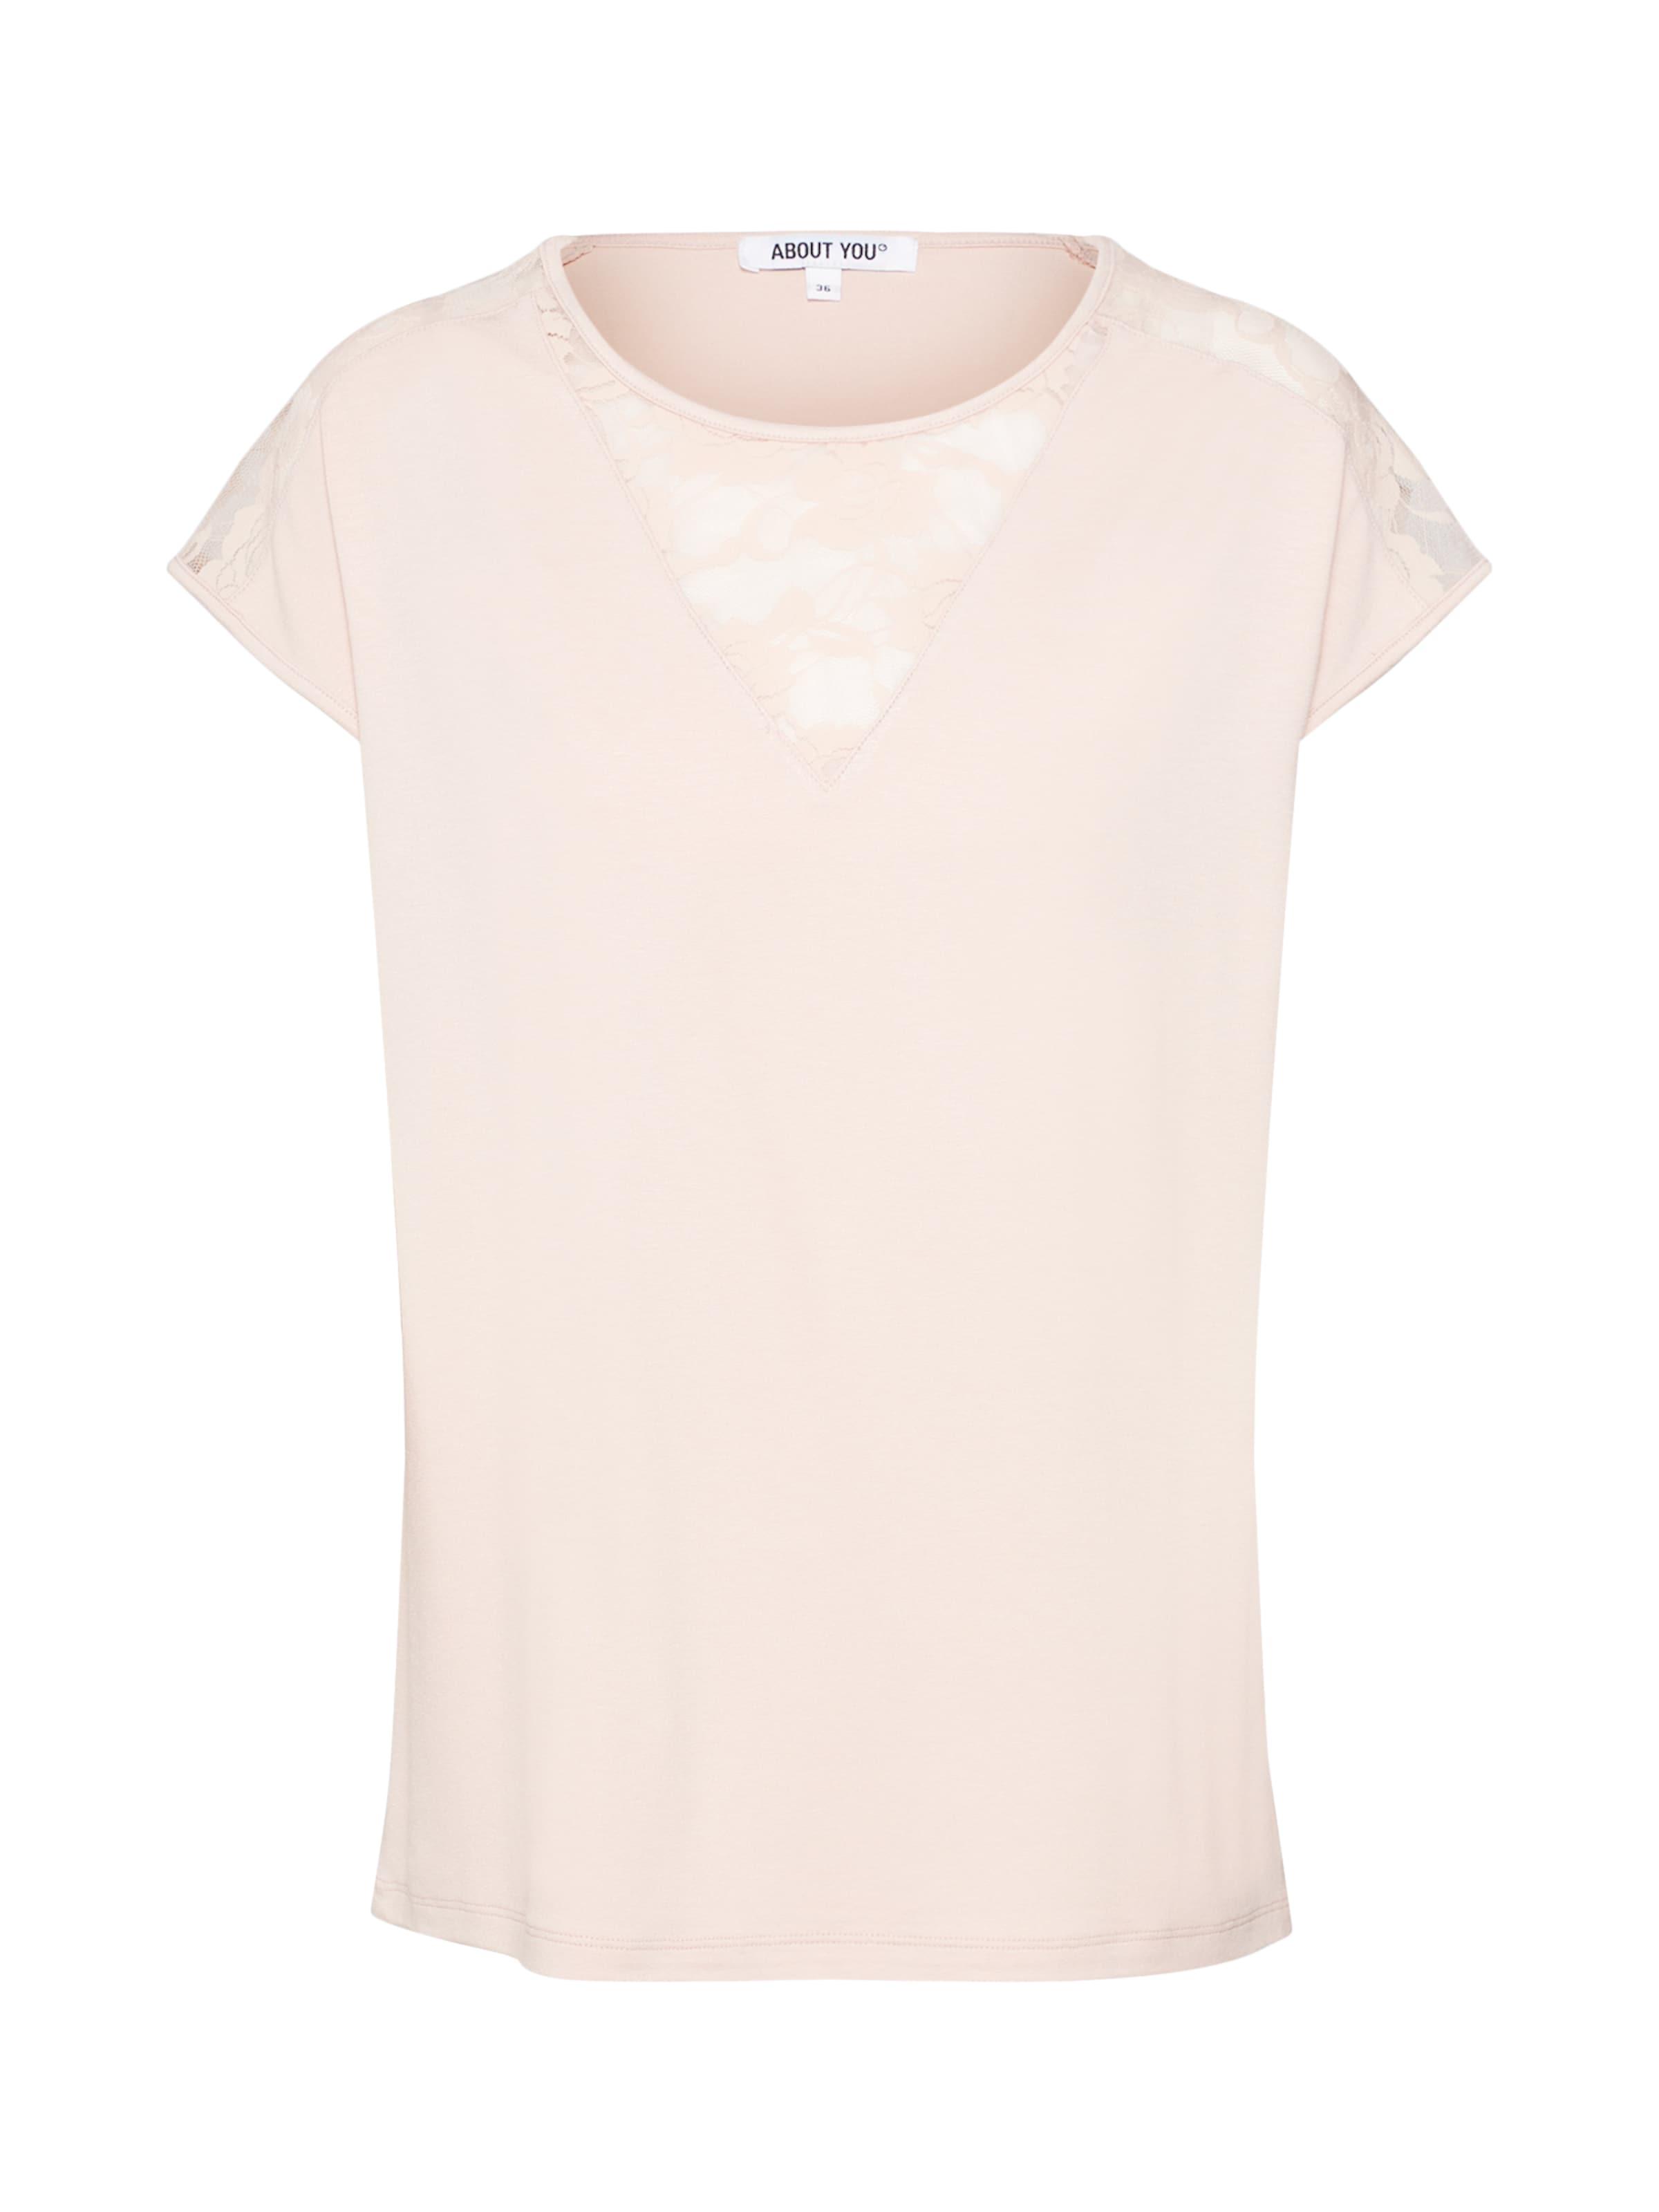 You 'iris' shirt About En Rose T rsCxhQtd